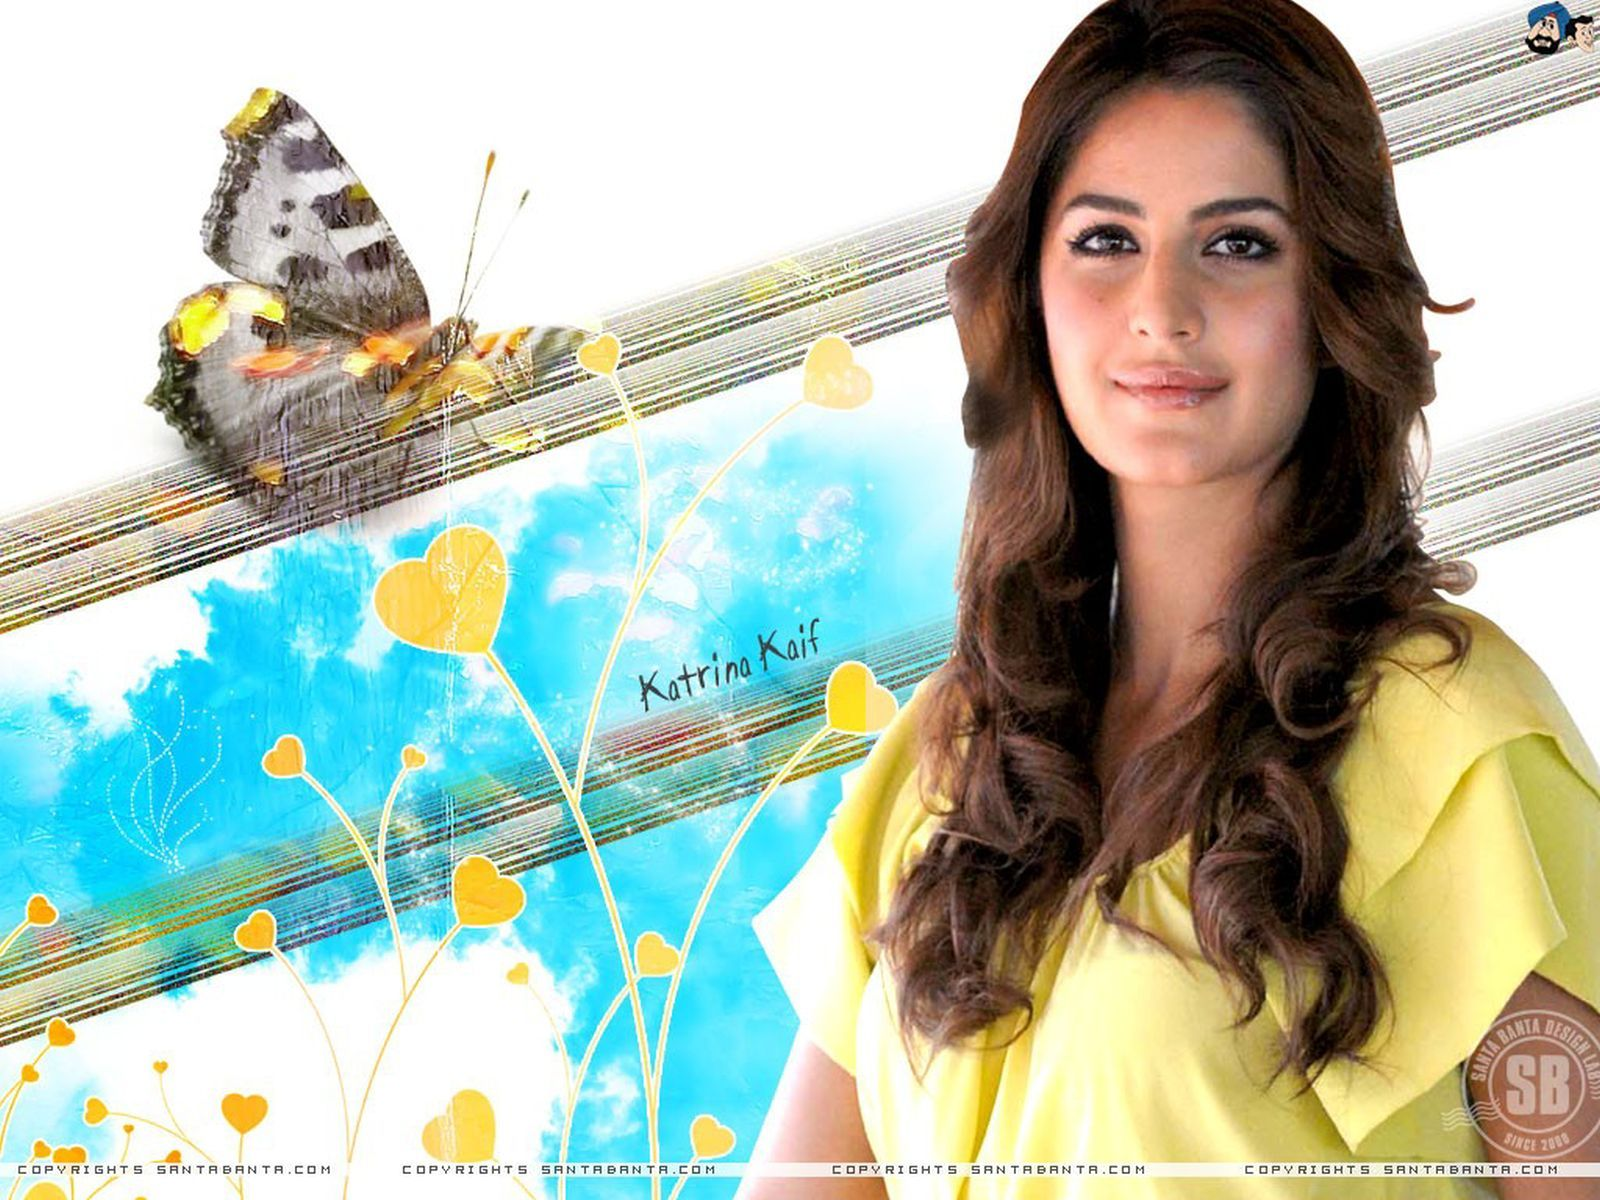 Hd wallpaper bollywood - Images About Bollywood Actress Kajal Agarwal Hd Wallpaper On 1600 1200 Wallpaper Bollywood 53